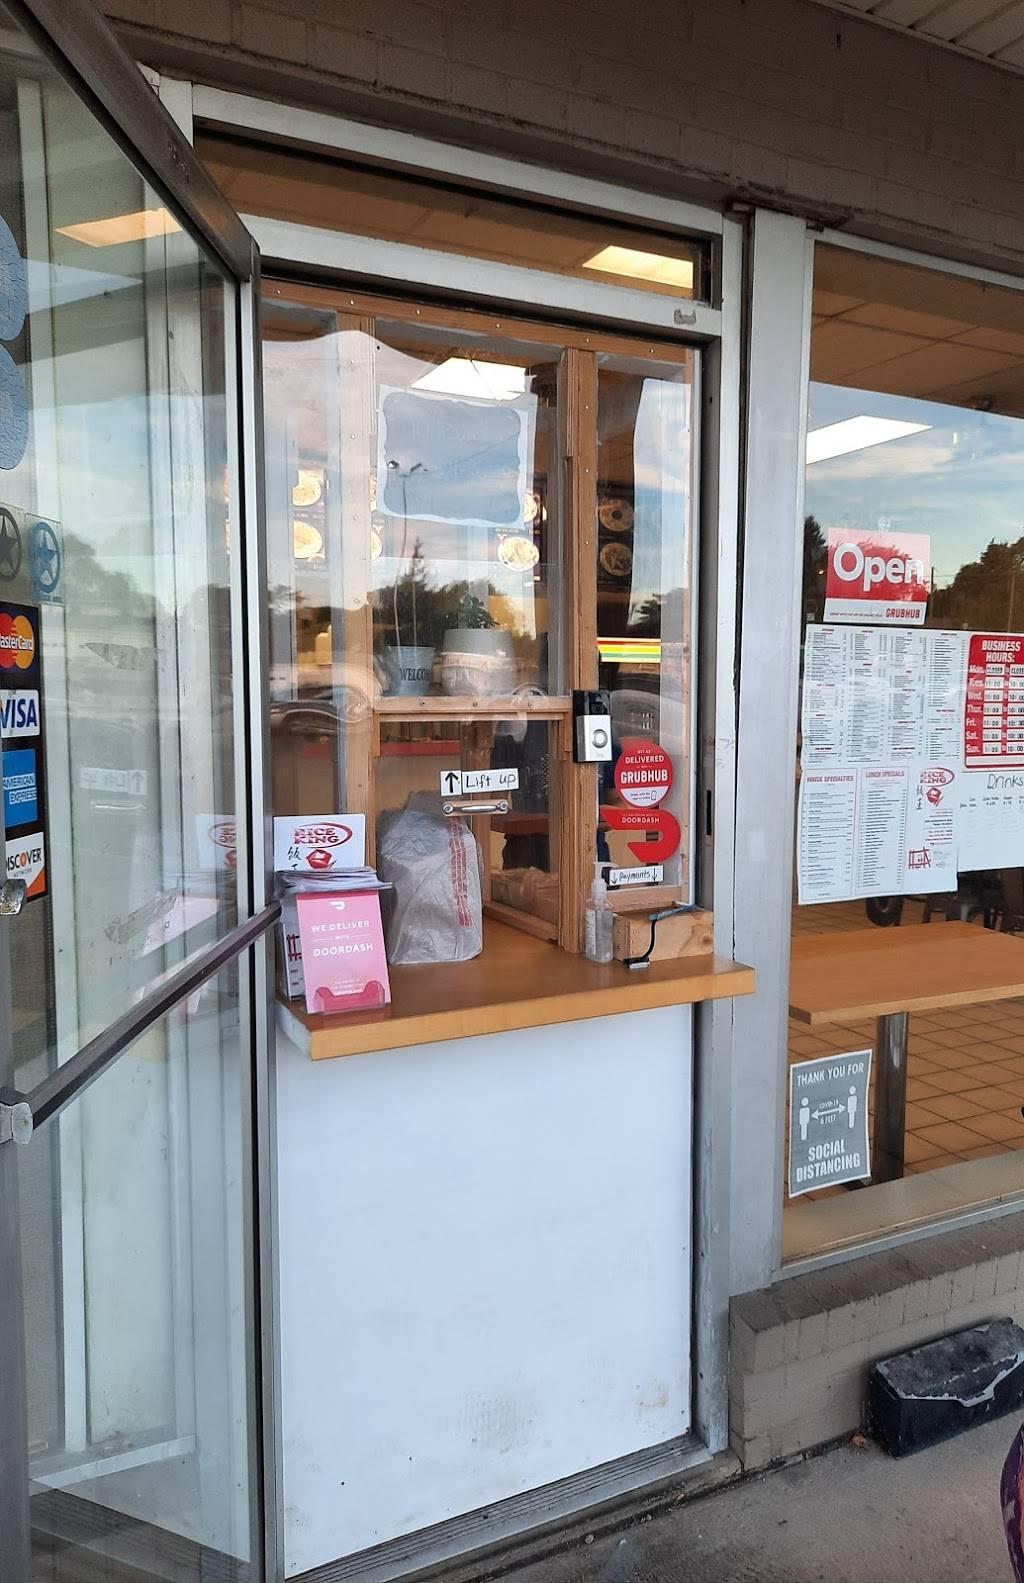 Rice King - restaurant  | Photo 2 of 4 | Address: 4400 Heatherdowns Blvd, Toledo, OH 43614, USA | Phone: (419) 381-8028